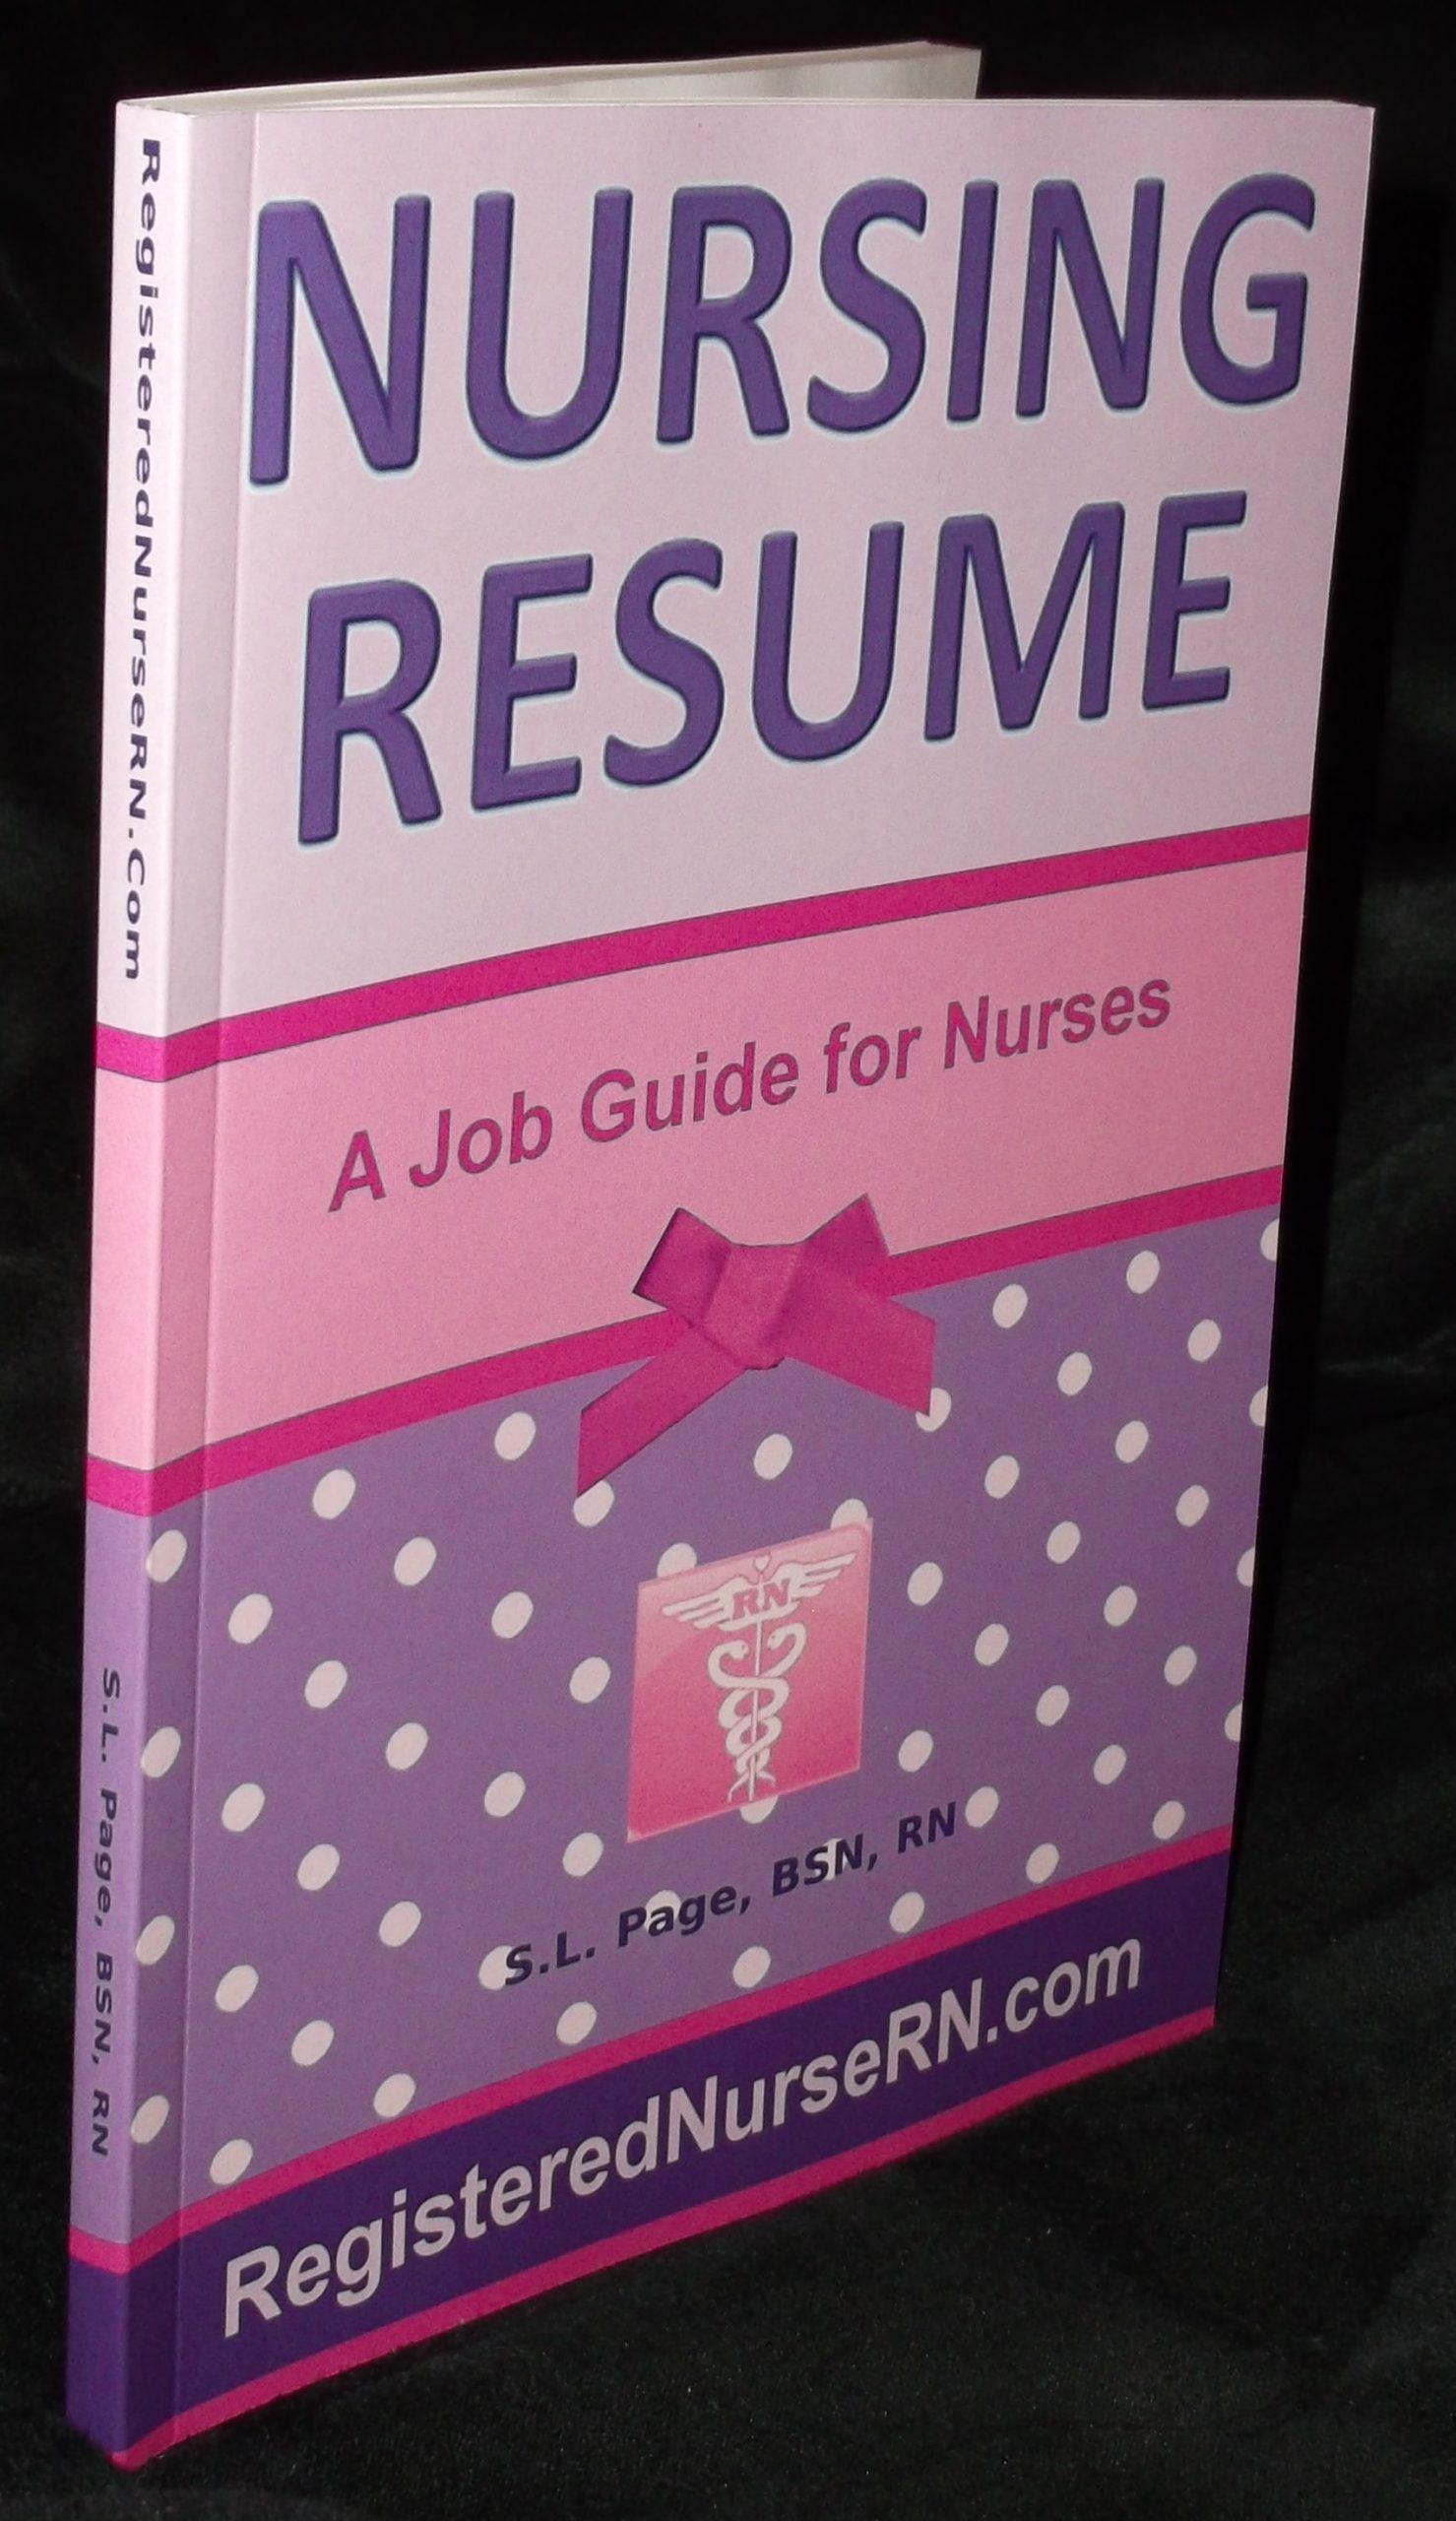 resume template nursing  Nursing Resume Templates: Plus an eBook Job Guide for Nurses - resume template nursing